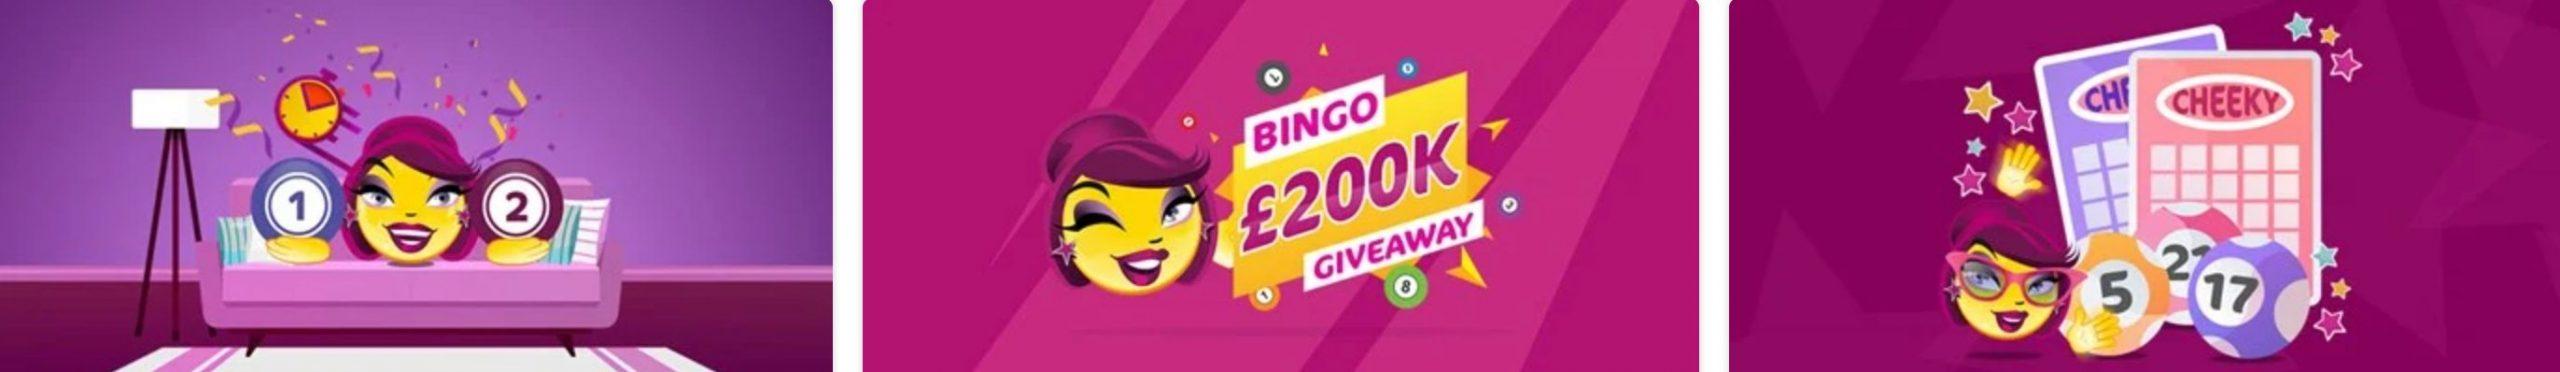 Cheeky Bingo Website Promotions